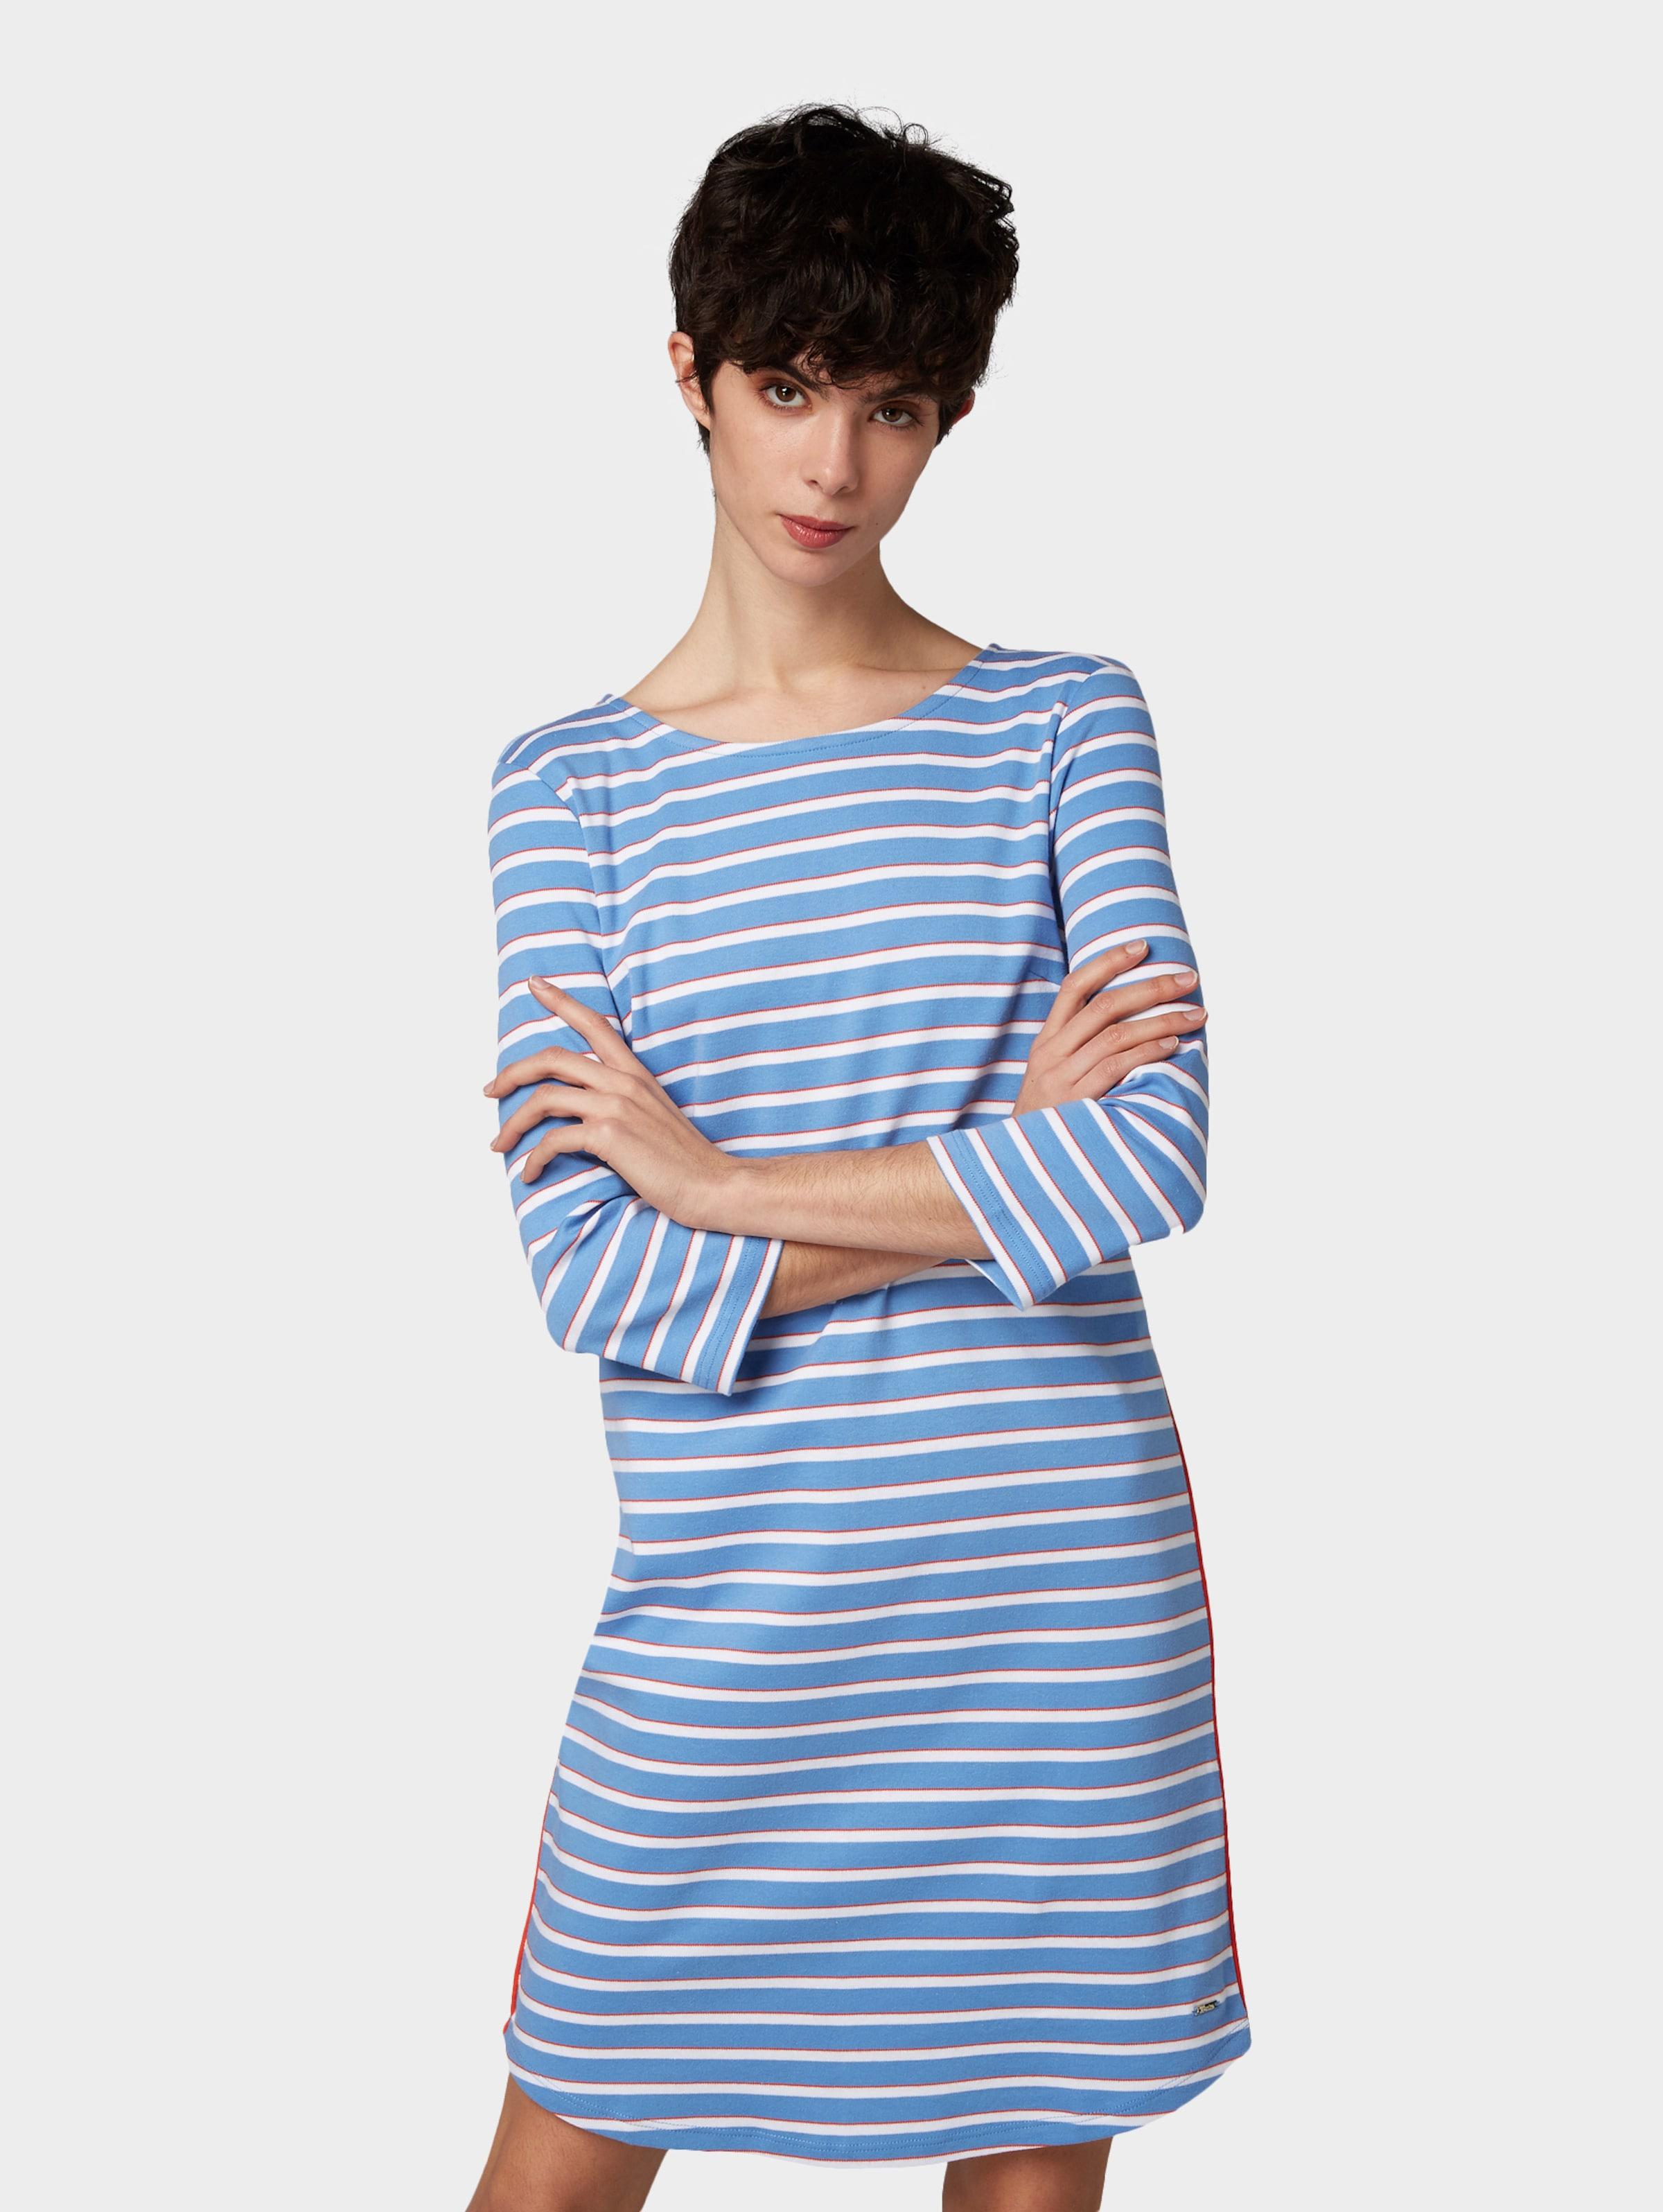 Denim Weiß HimmelblauRot Tailor In Kleid Tom J3FKTlc1